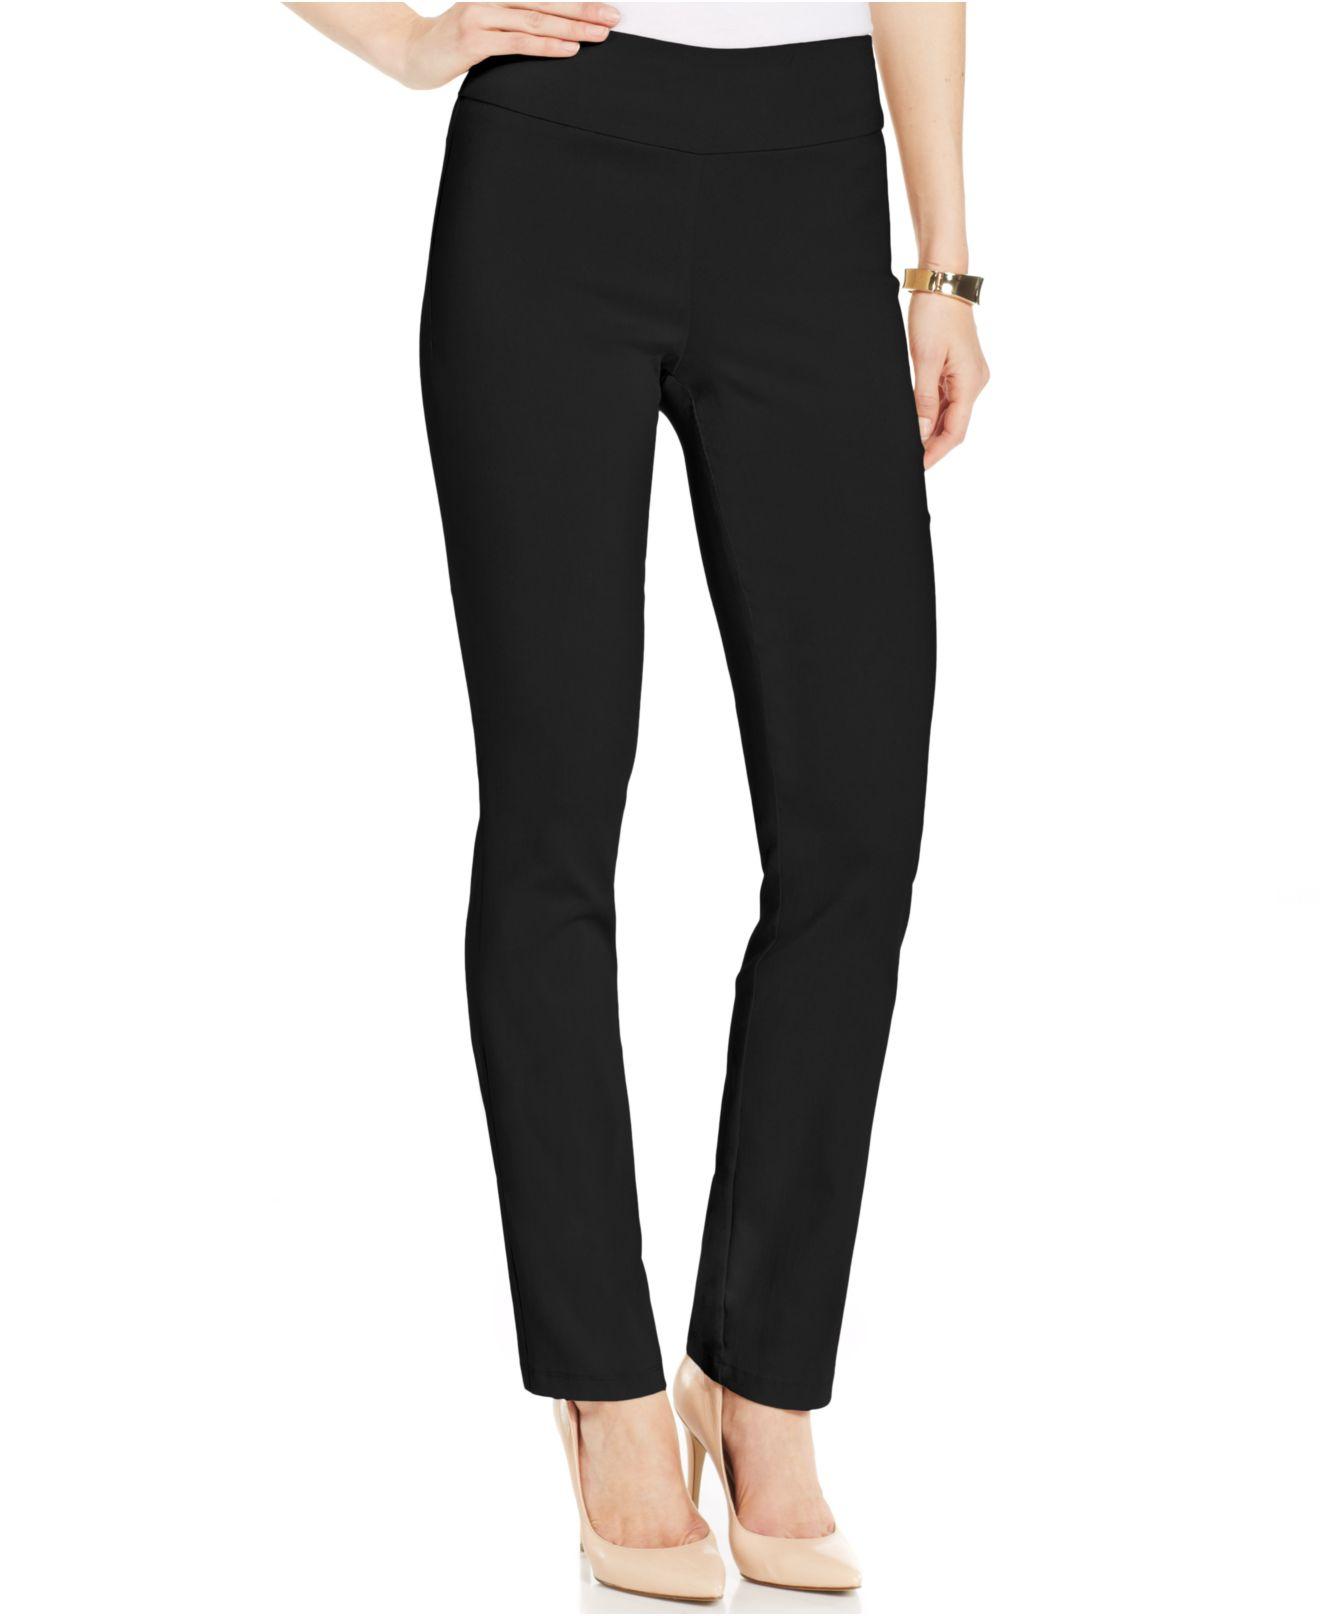 Brilliant  All Kasper Deep Black Women39s Size 16P Petite Straight Leg Dress Pants